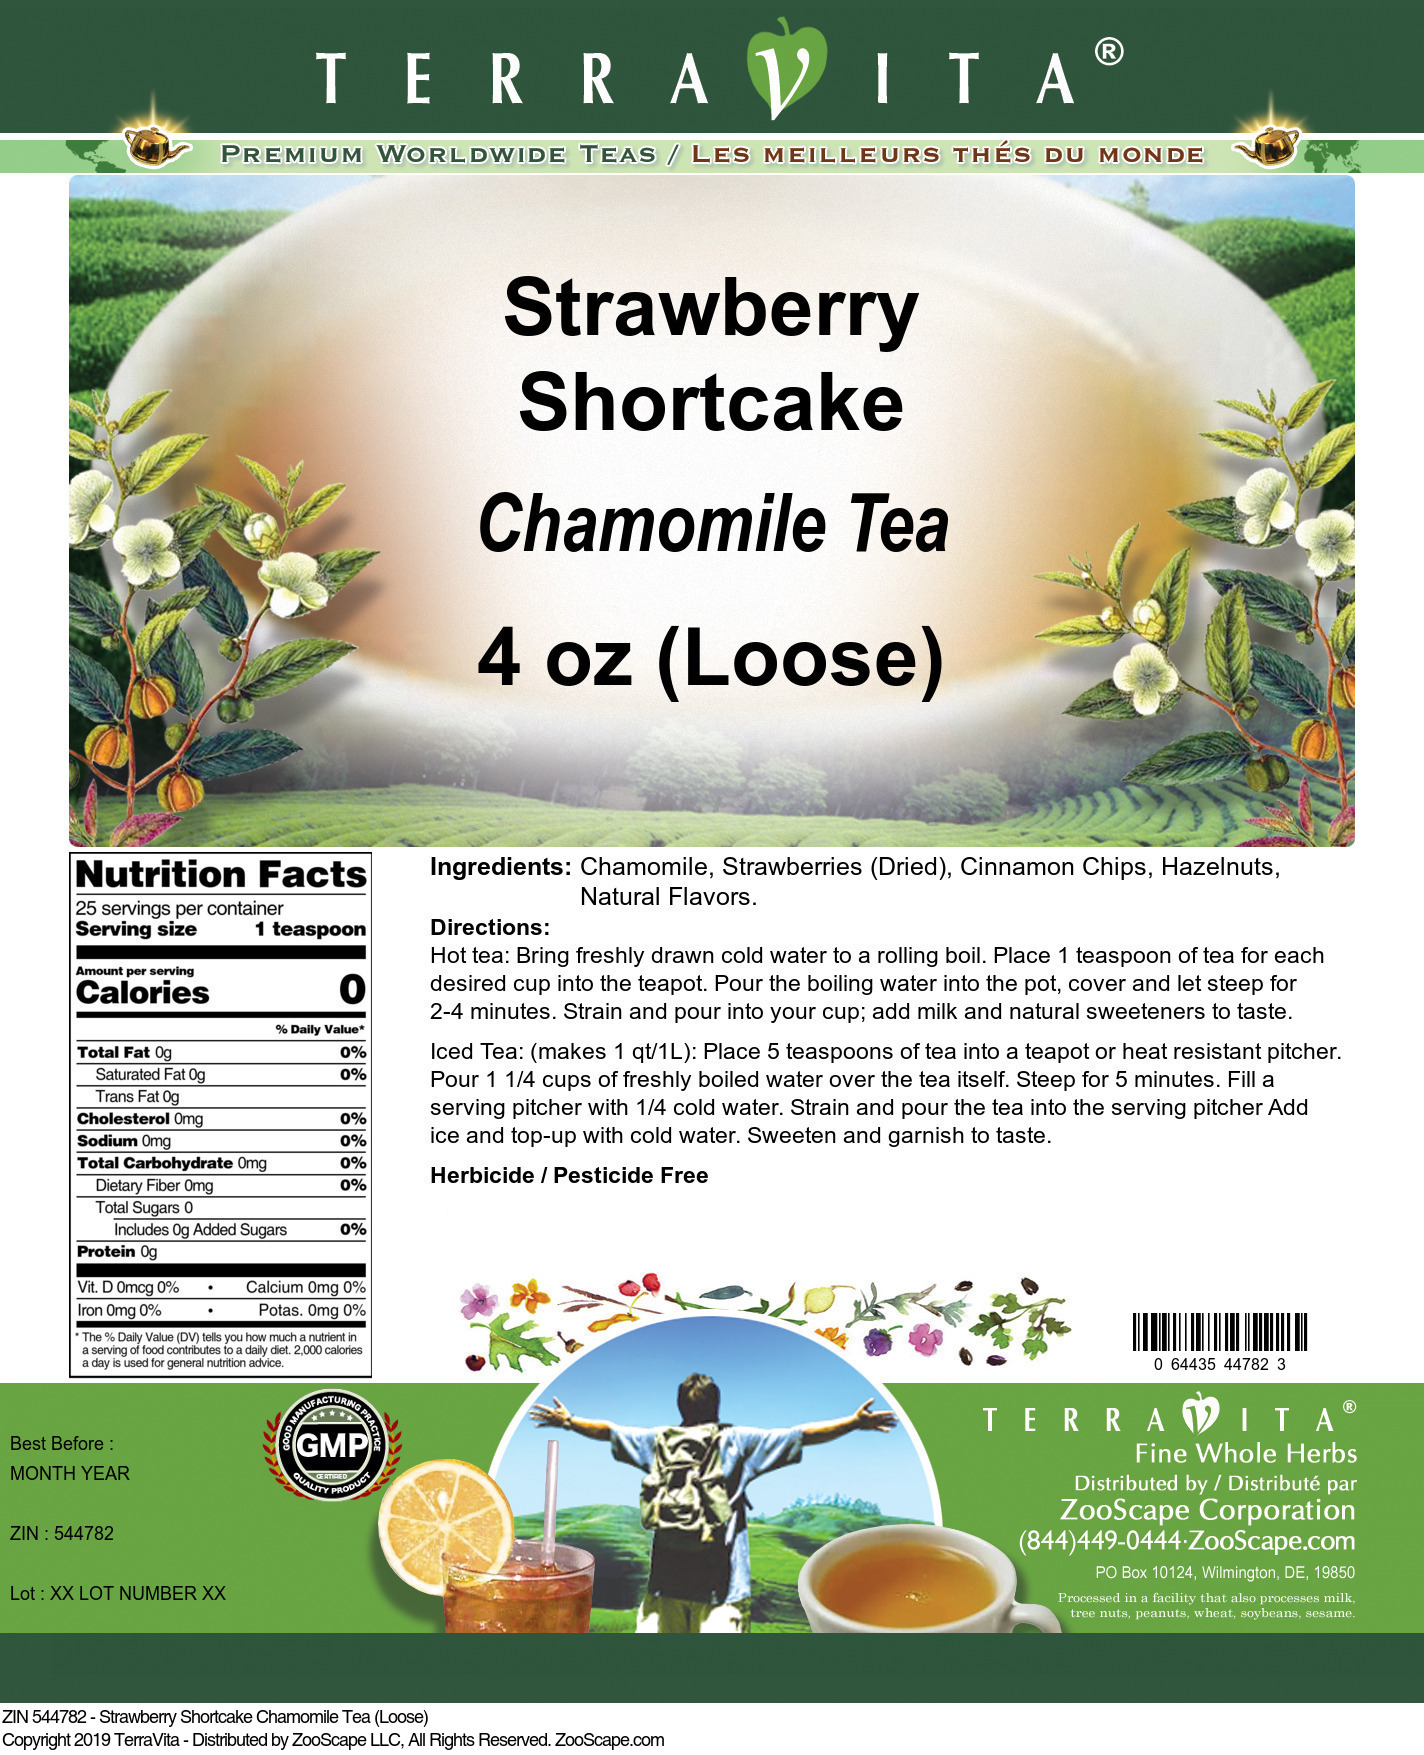 Strawberry Shortcake Chamomile Tea (Loose)